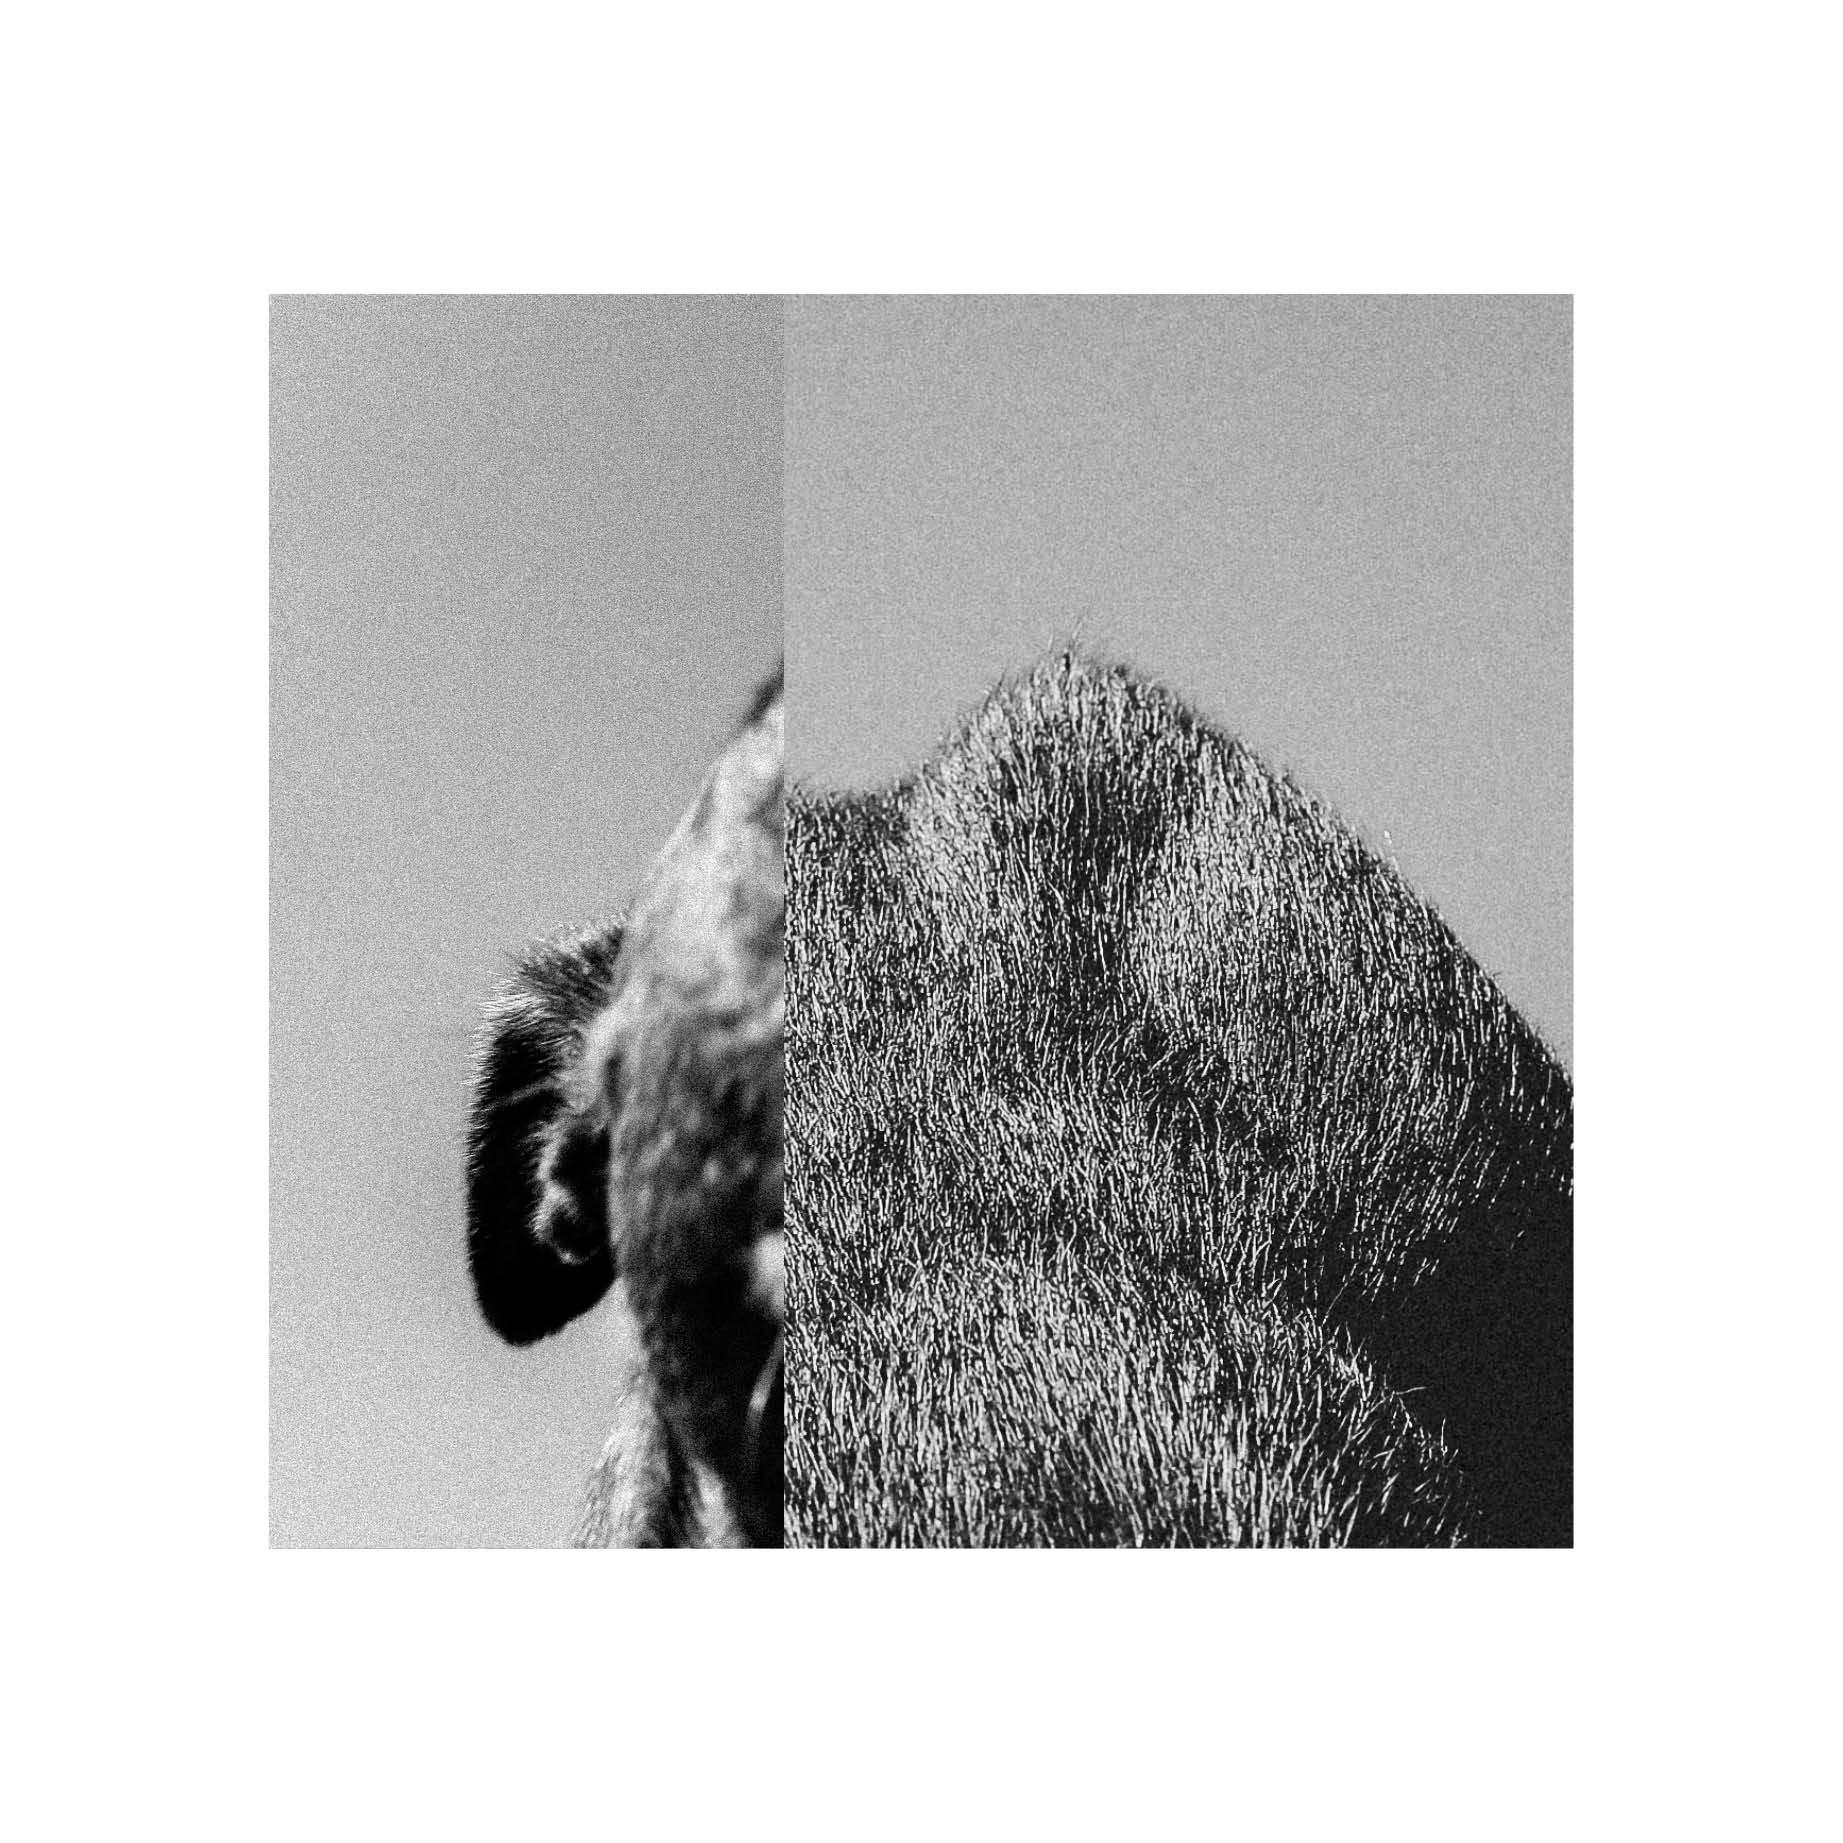 samana, samana music, samana Photography, abstract black and white, Rebecca Rose Harris